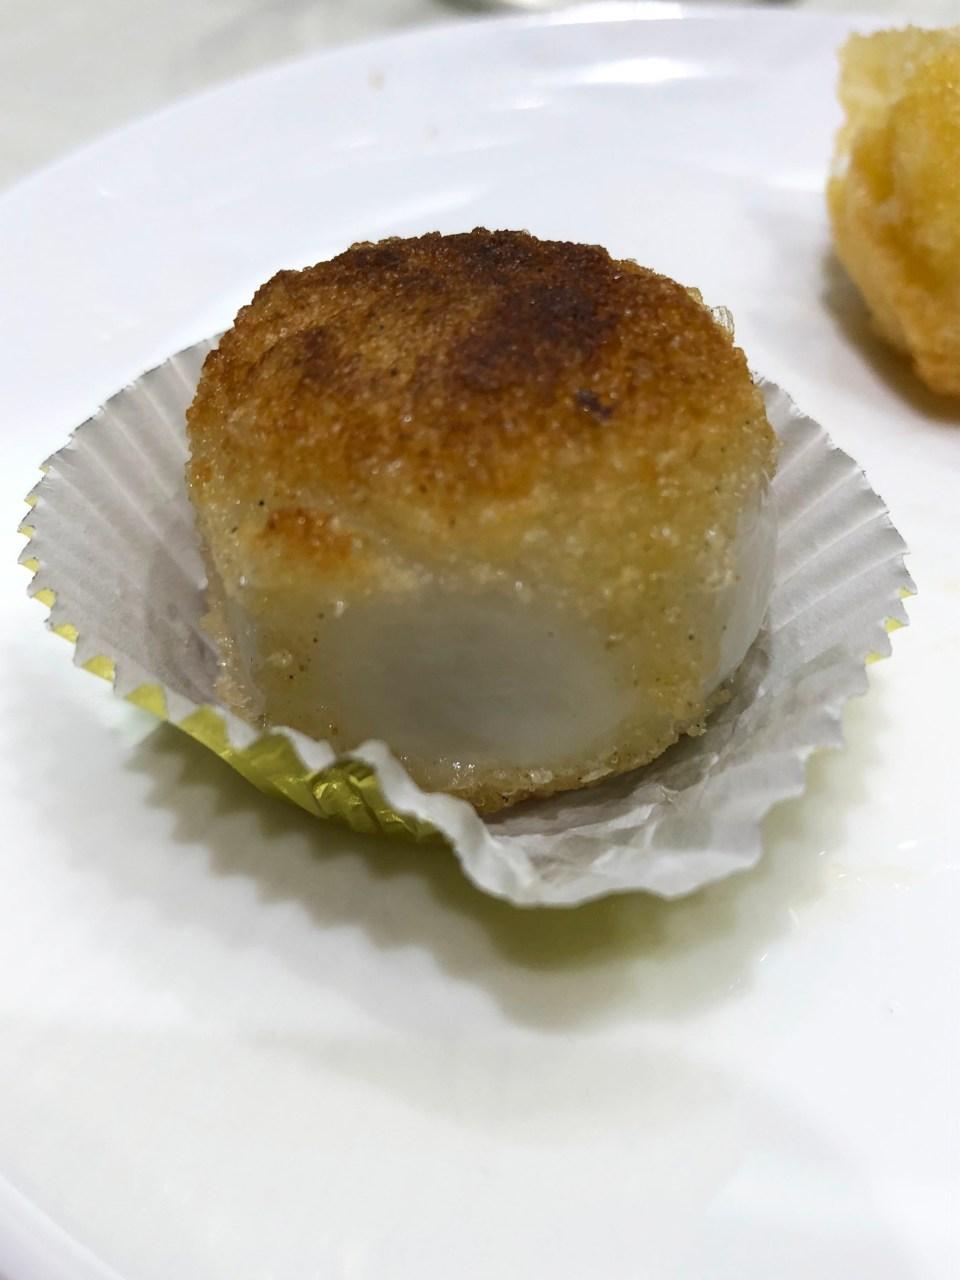 Chinese sweet dessert